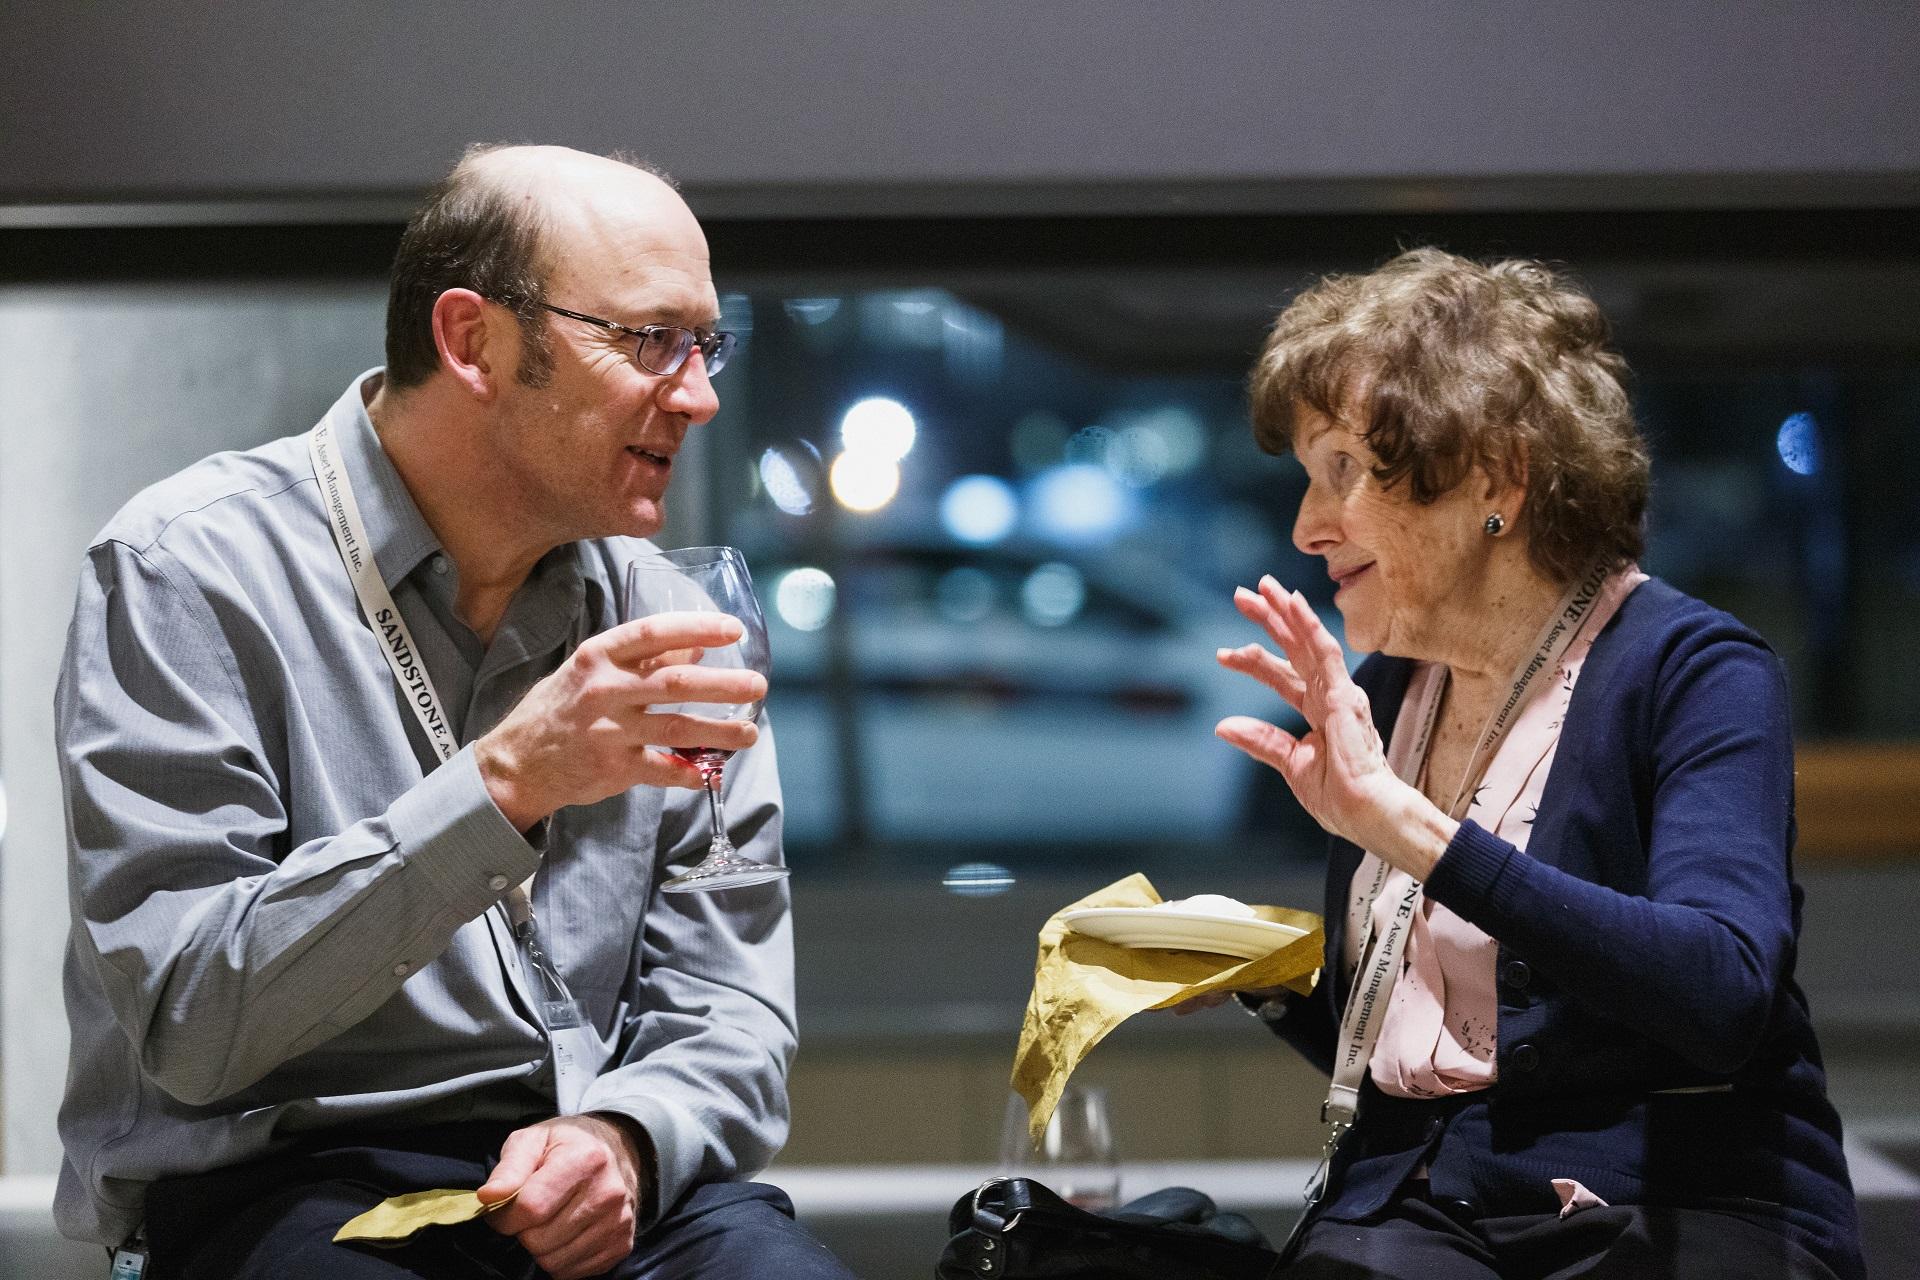 Insightful conversation between guests